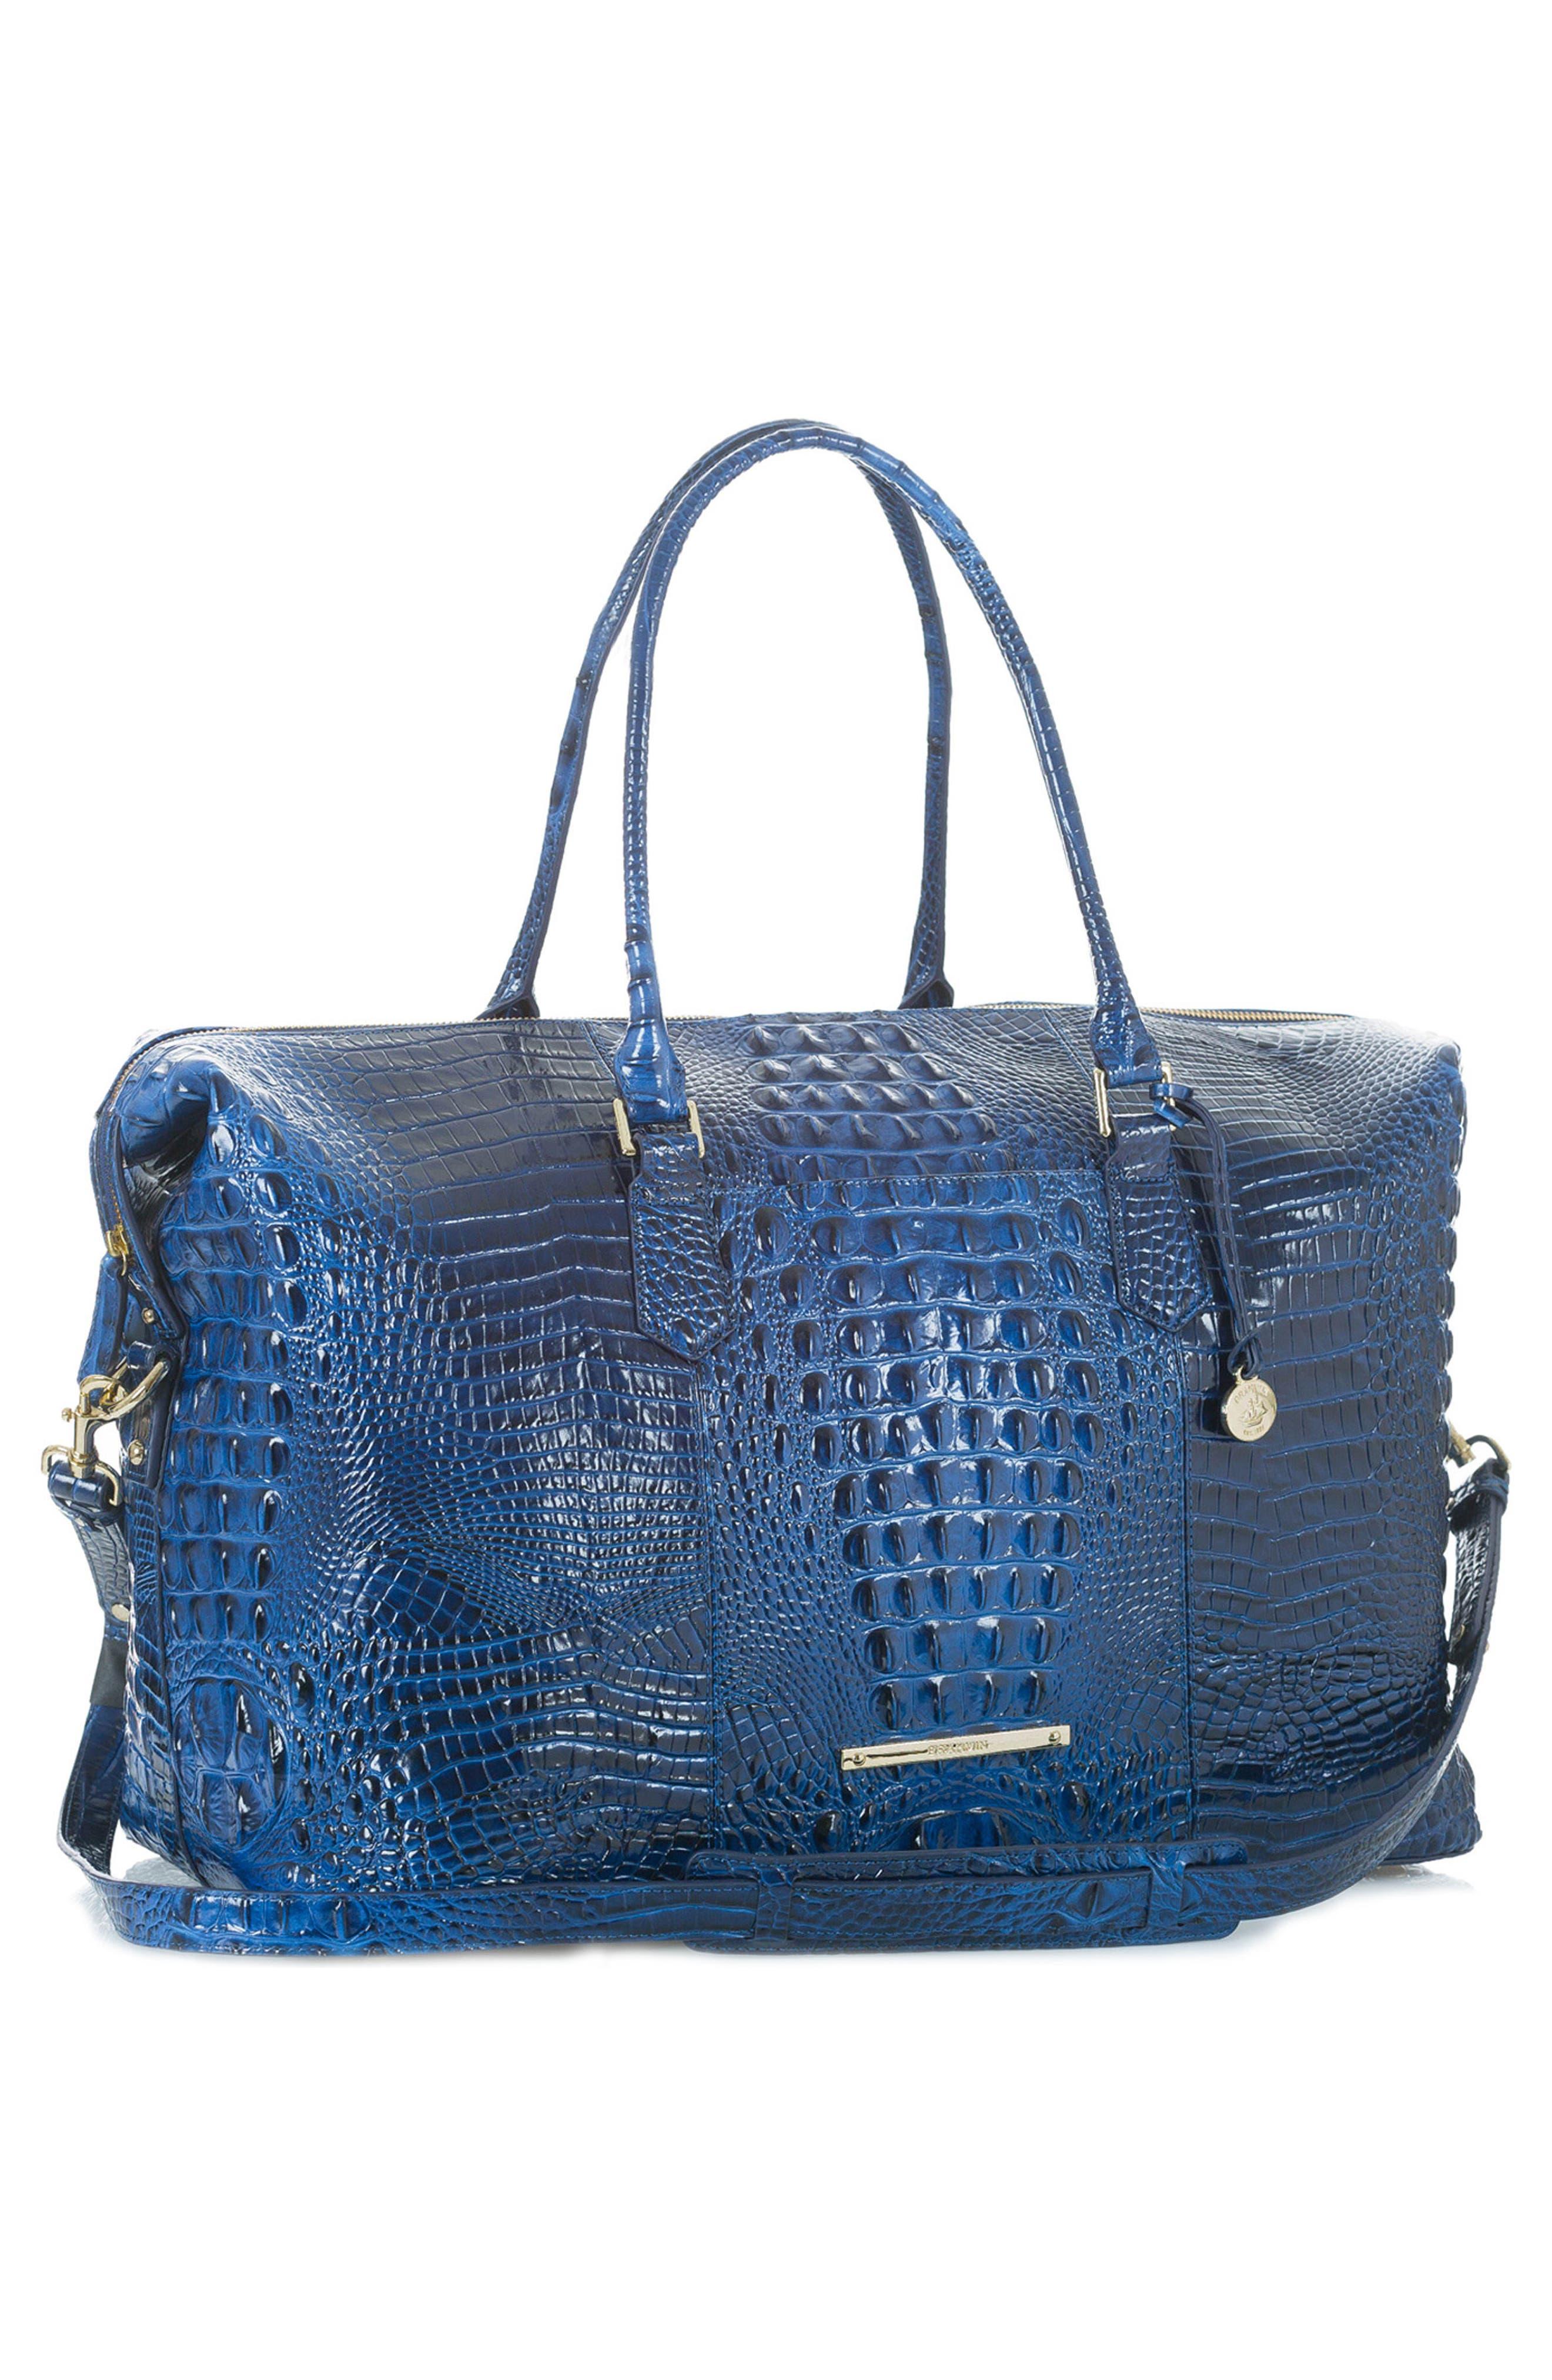 'Duxbury' Leather Travel Bag,                             Alternate thumbnail 9, color,